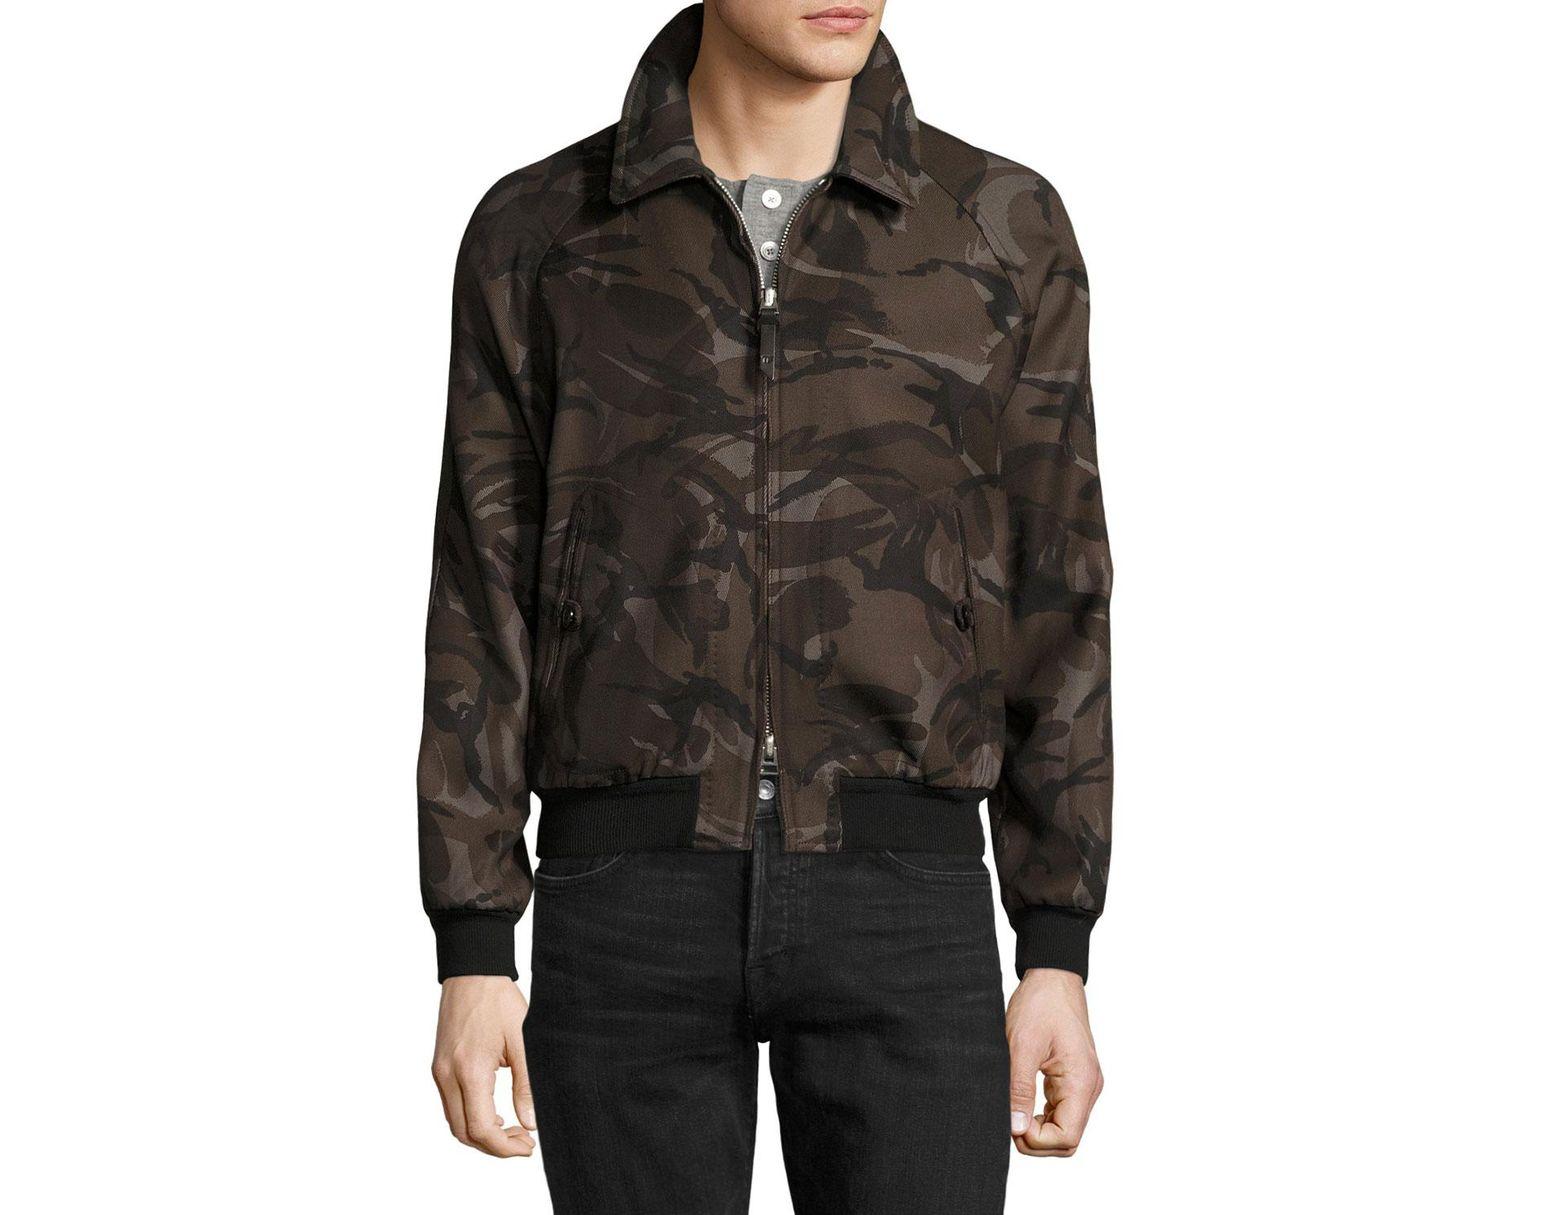 34ba8df3a1aec Tom Ford Camouflage Raglan Bomber Jacket for Men - Lyst